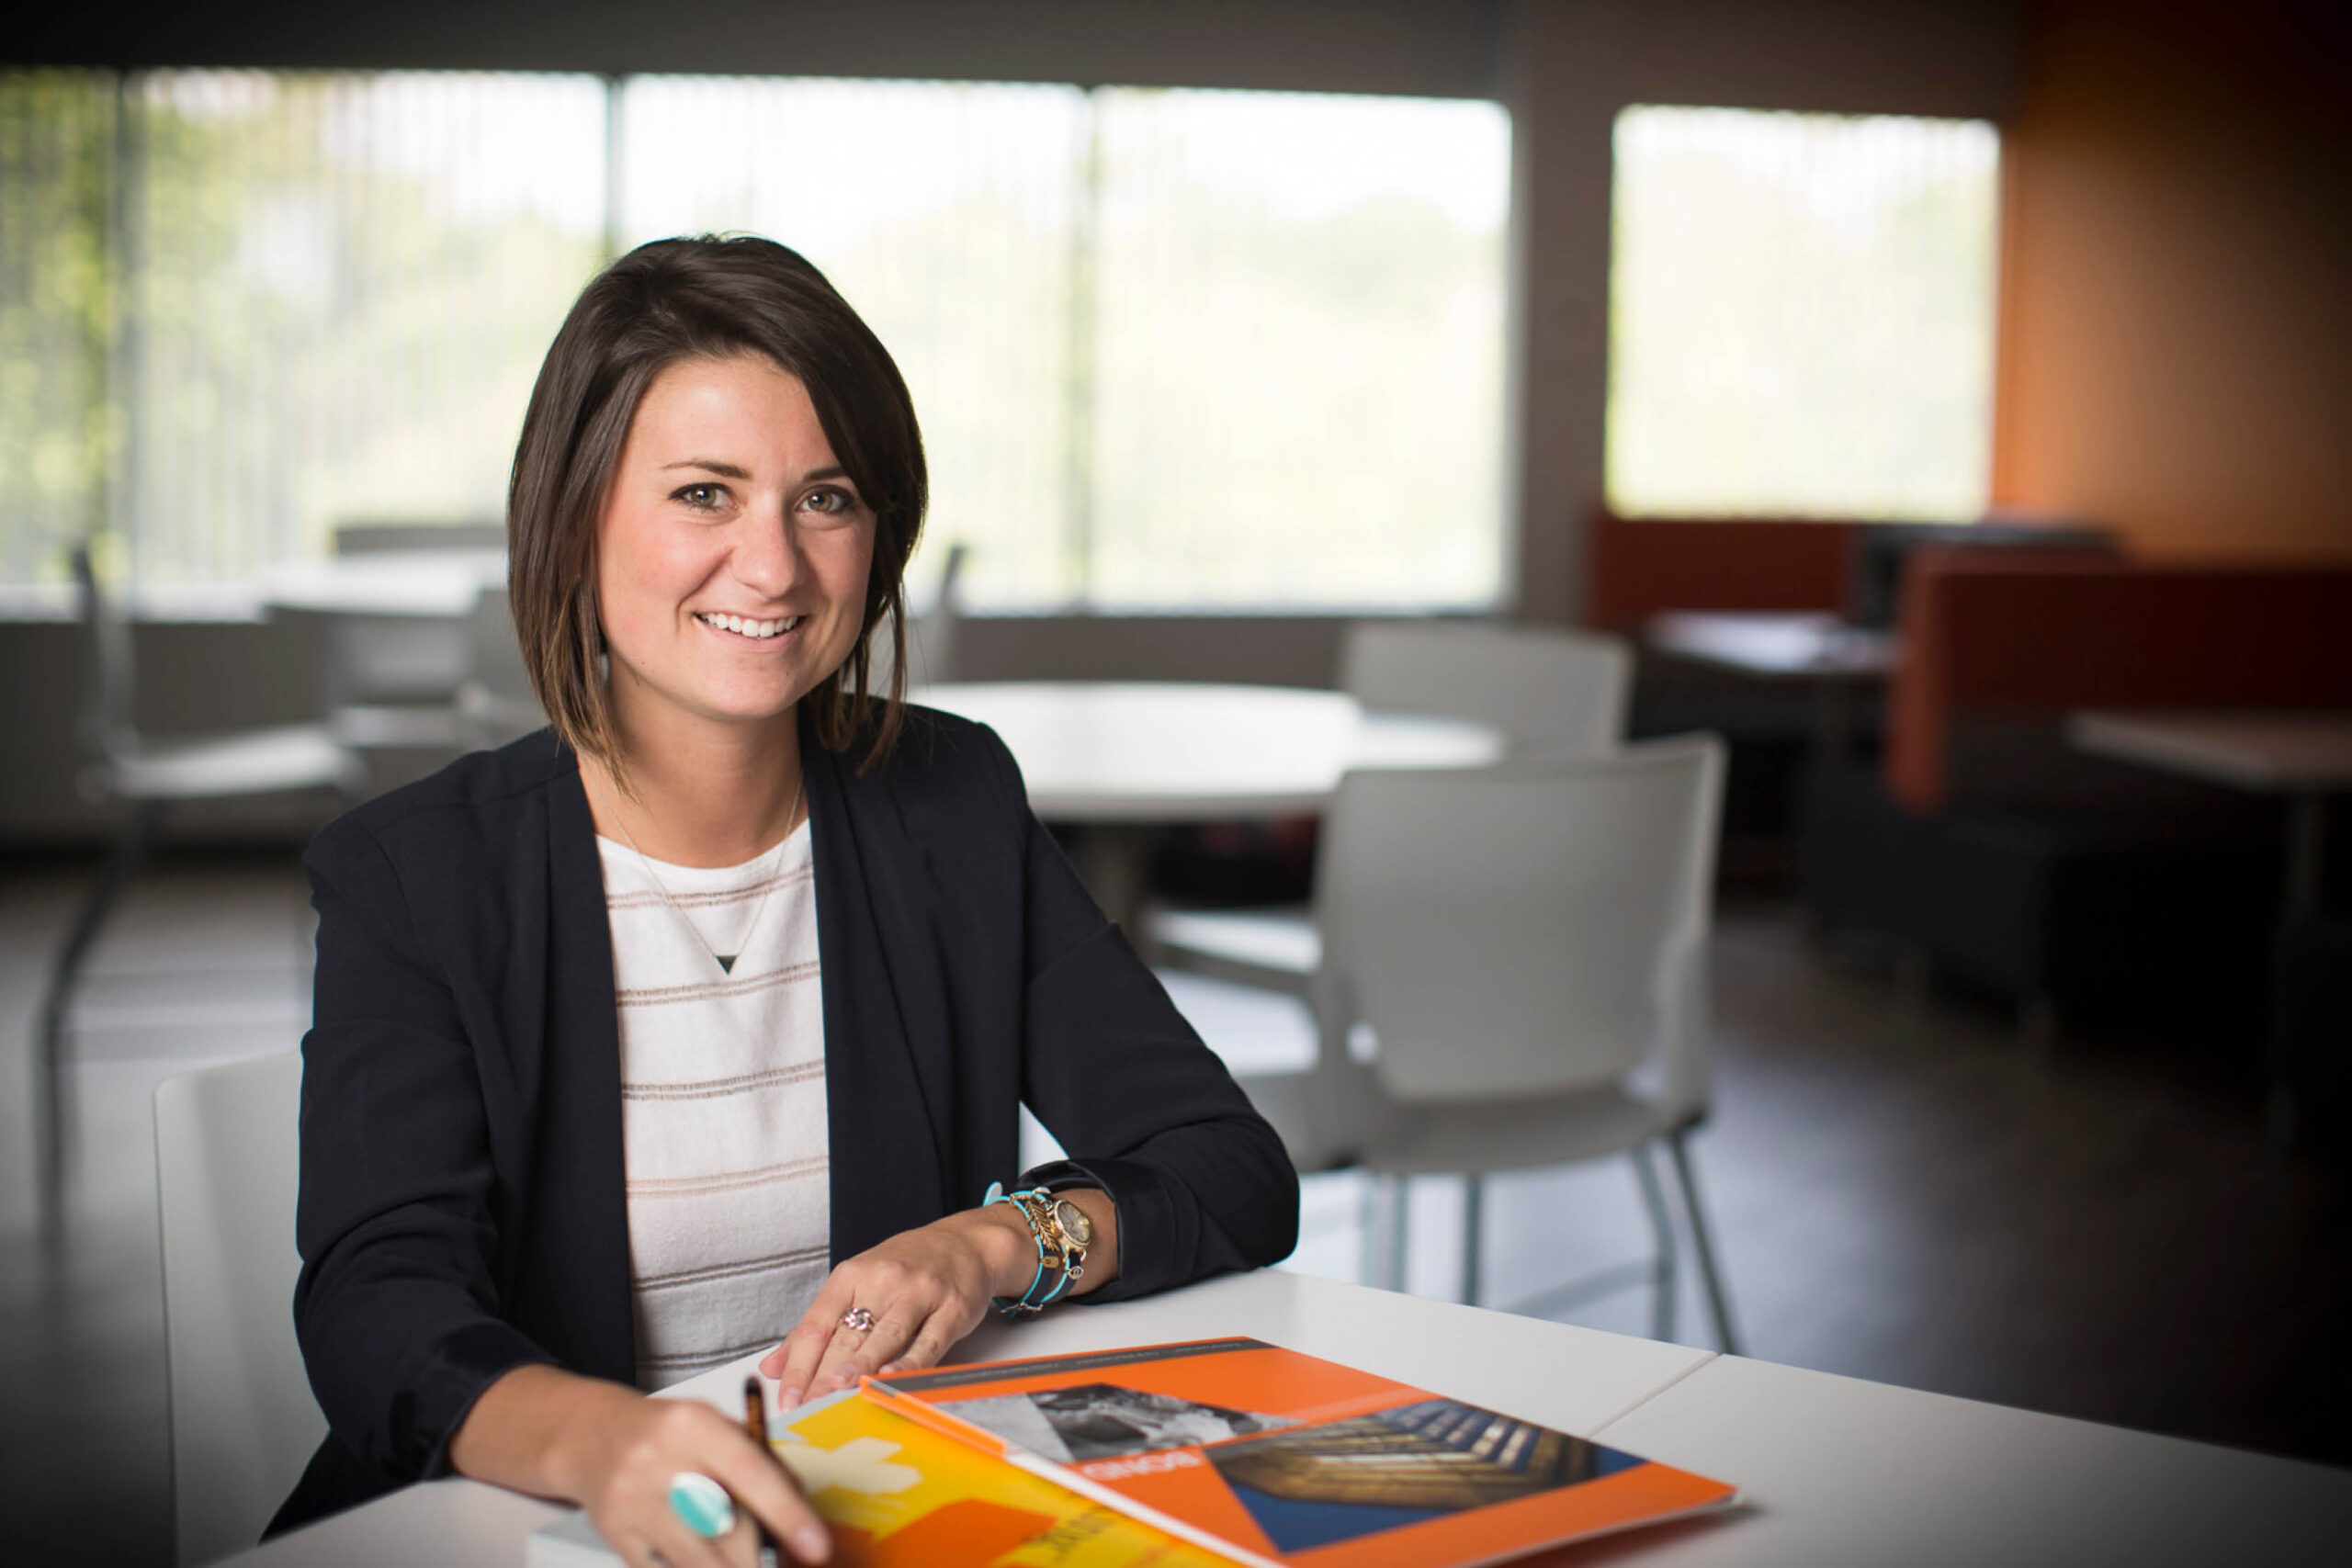 Olivia Gardner Professional Women in Construction 40 under 40 Award Winner